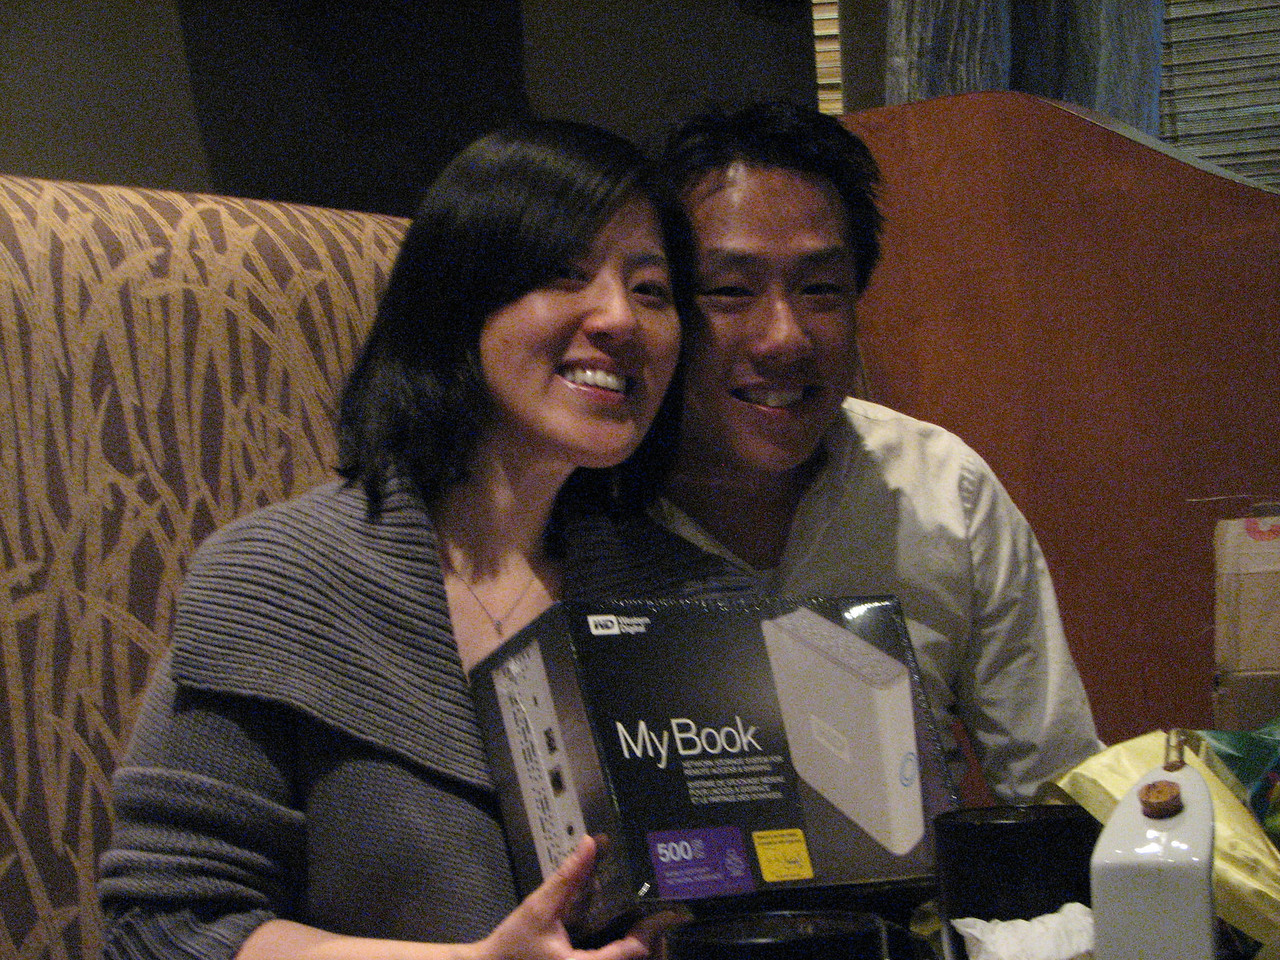 2008 03 15 Sat - Toros - Sojin Kim & Larry Lee opening presents